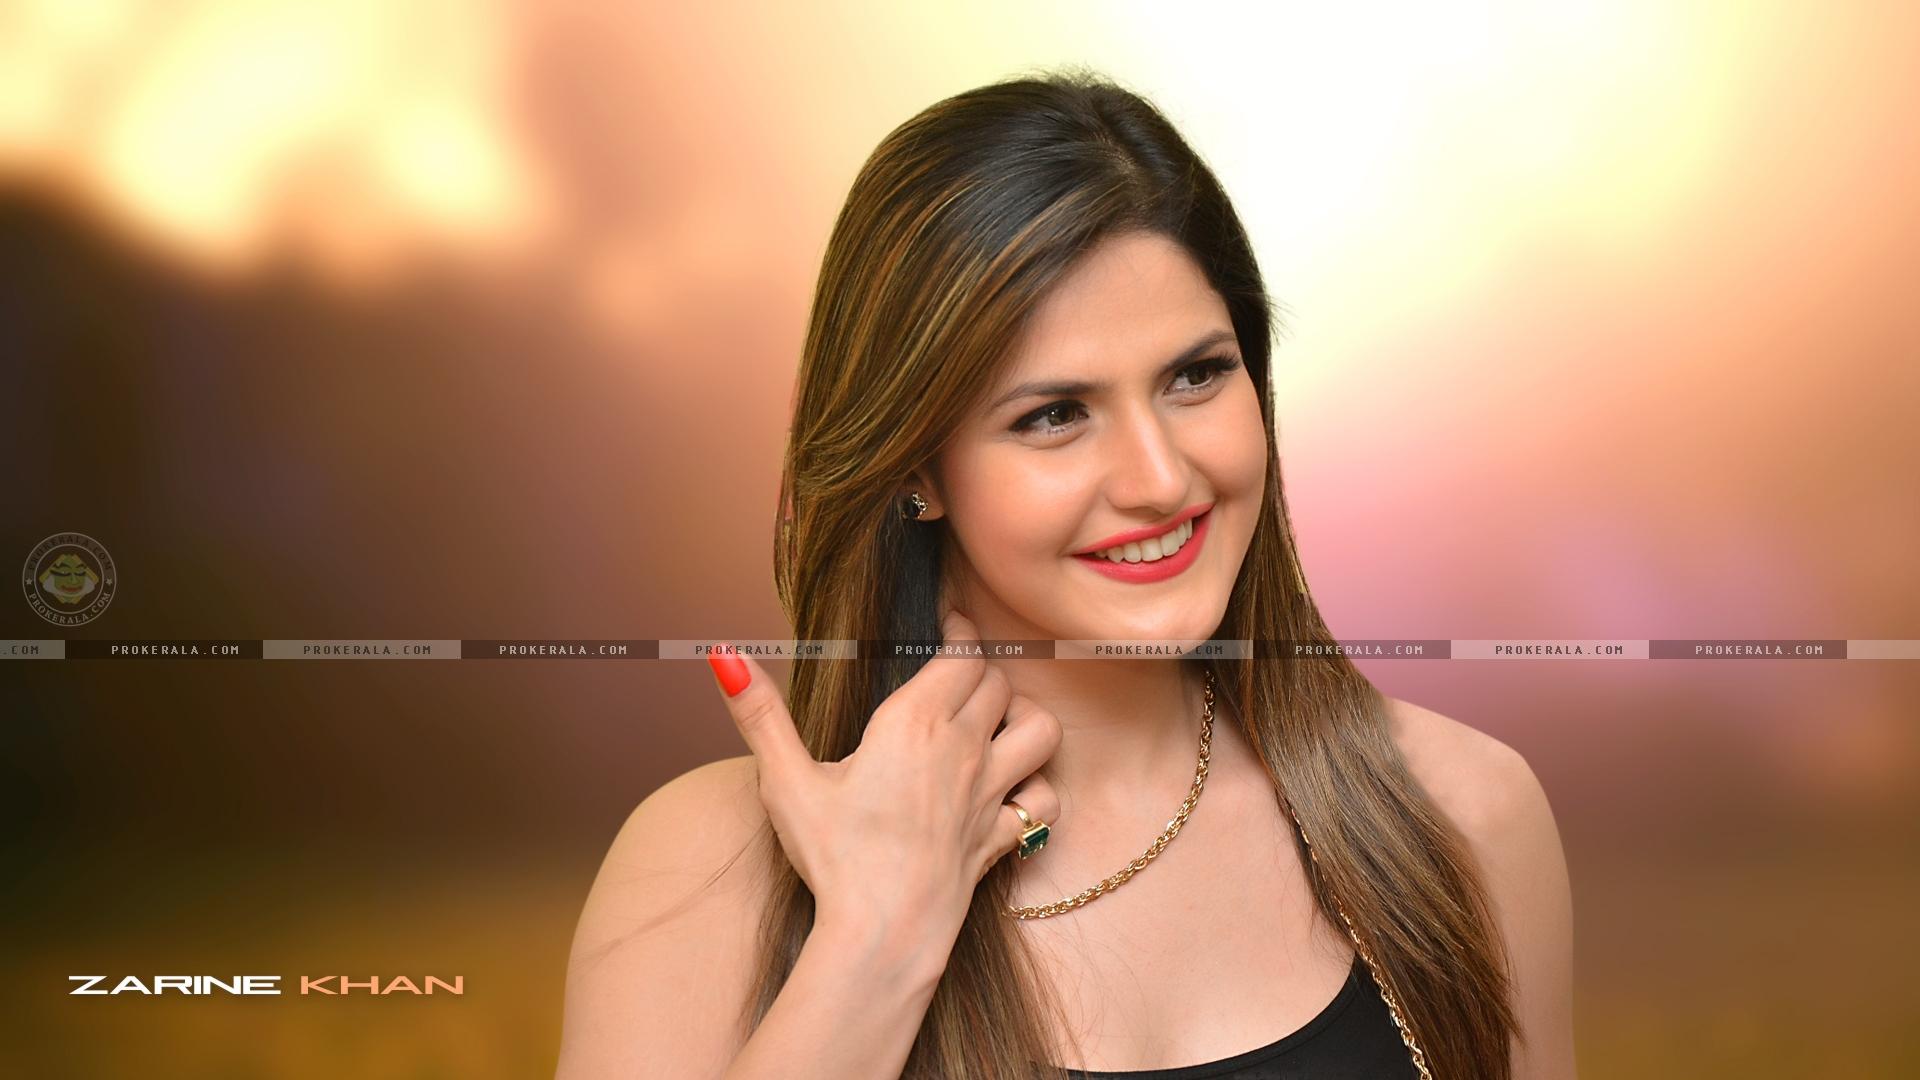 Zarine khan photo download